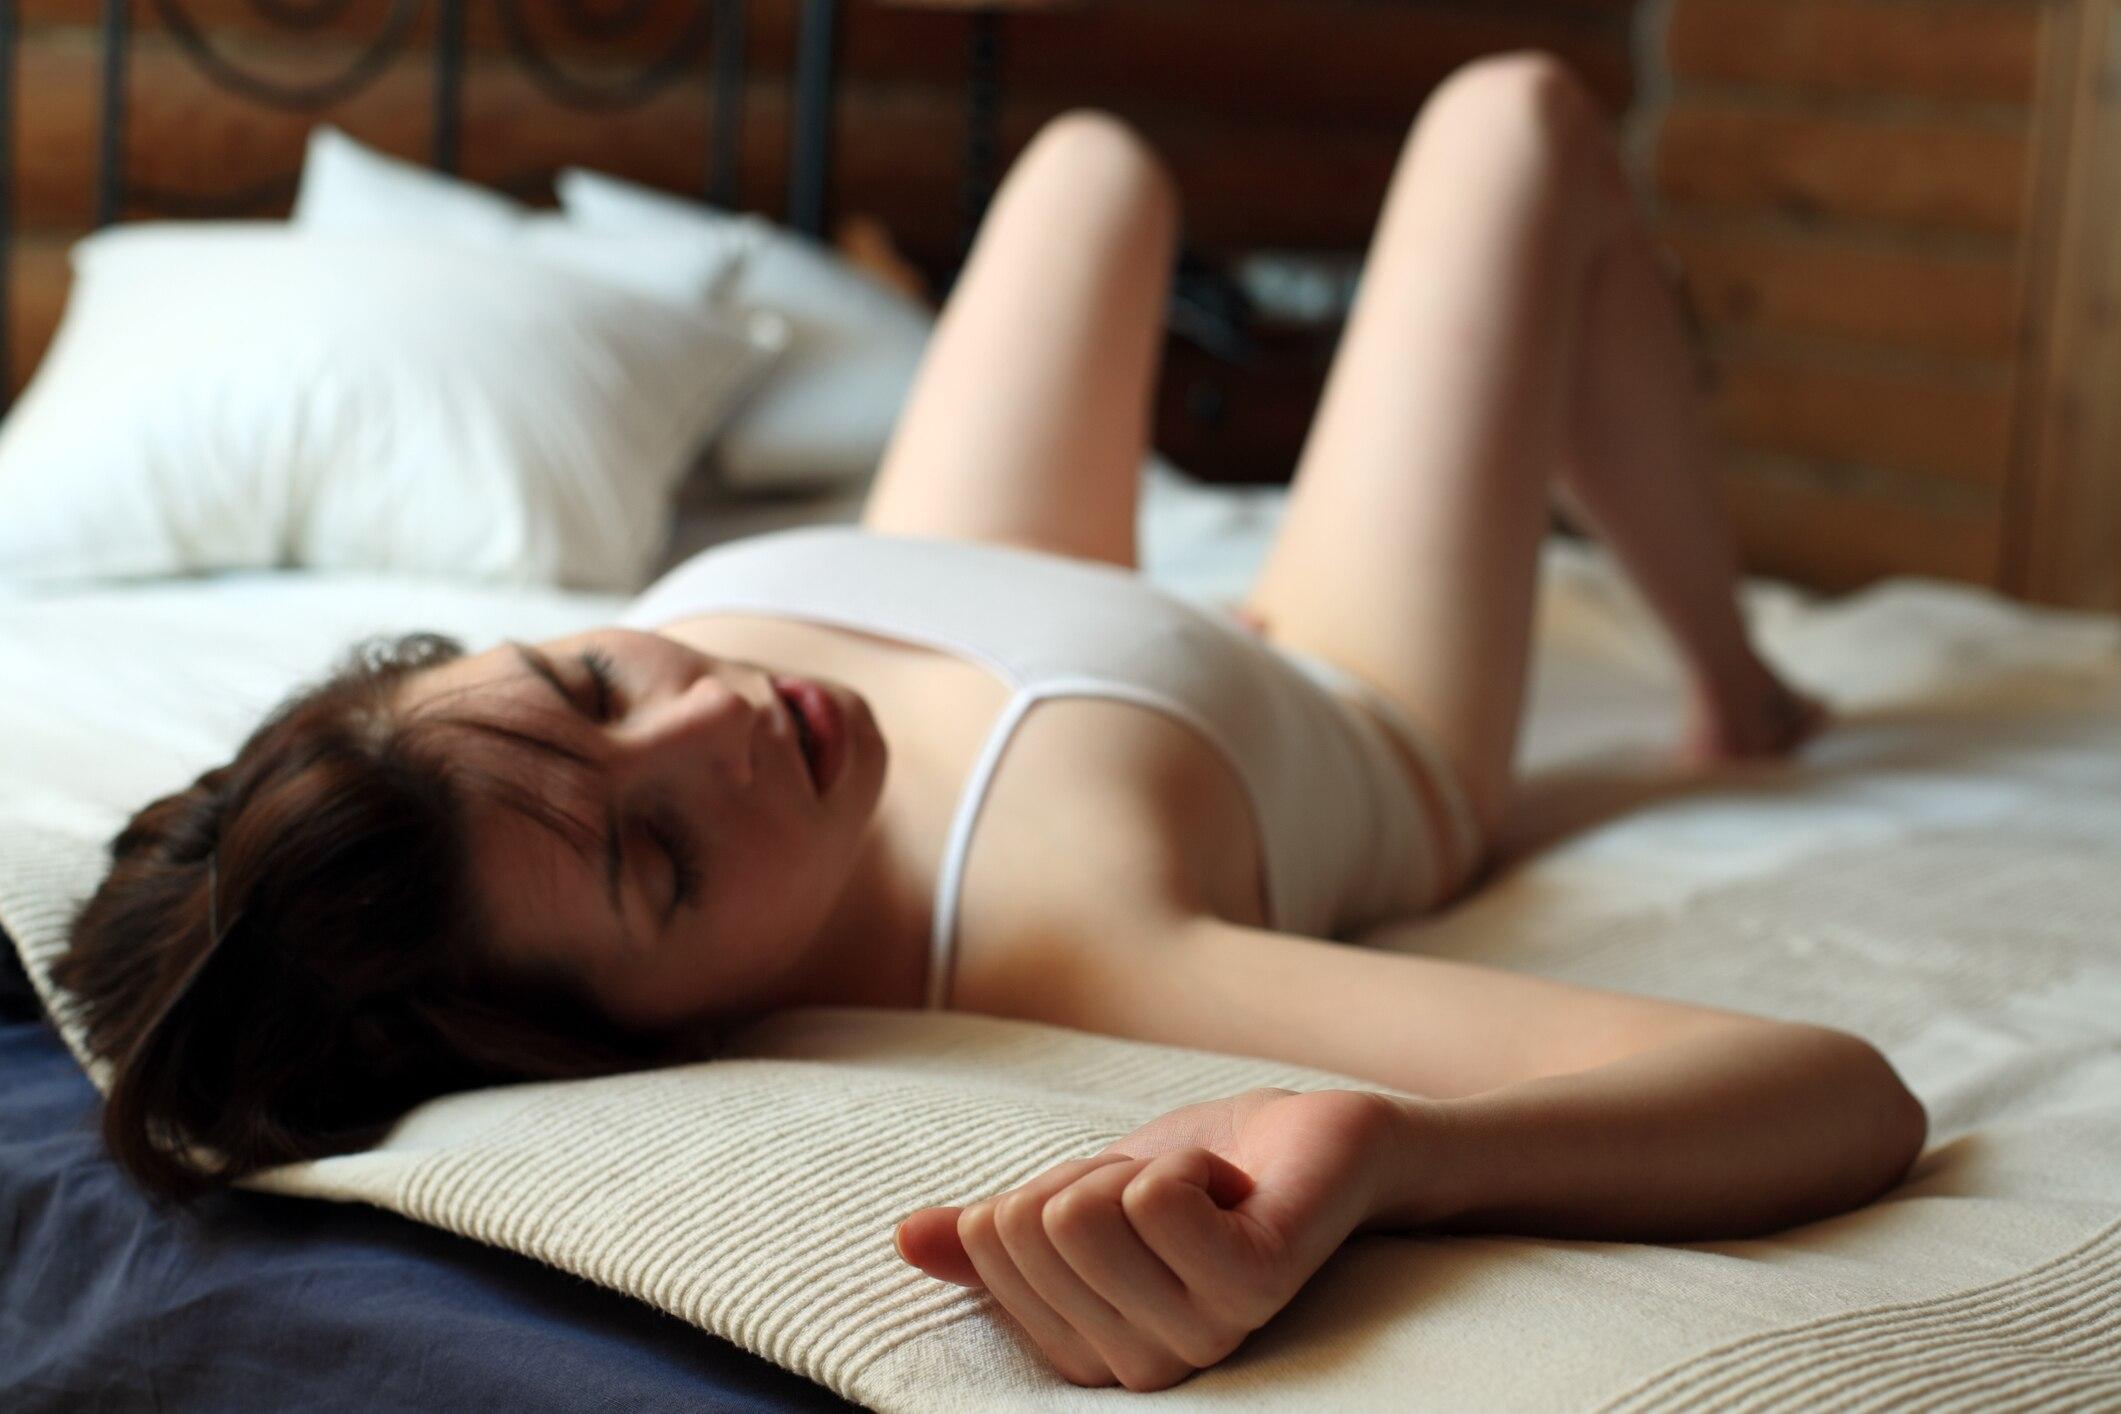 Selbstbefriedigung im schlaf